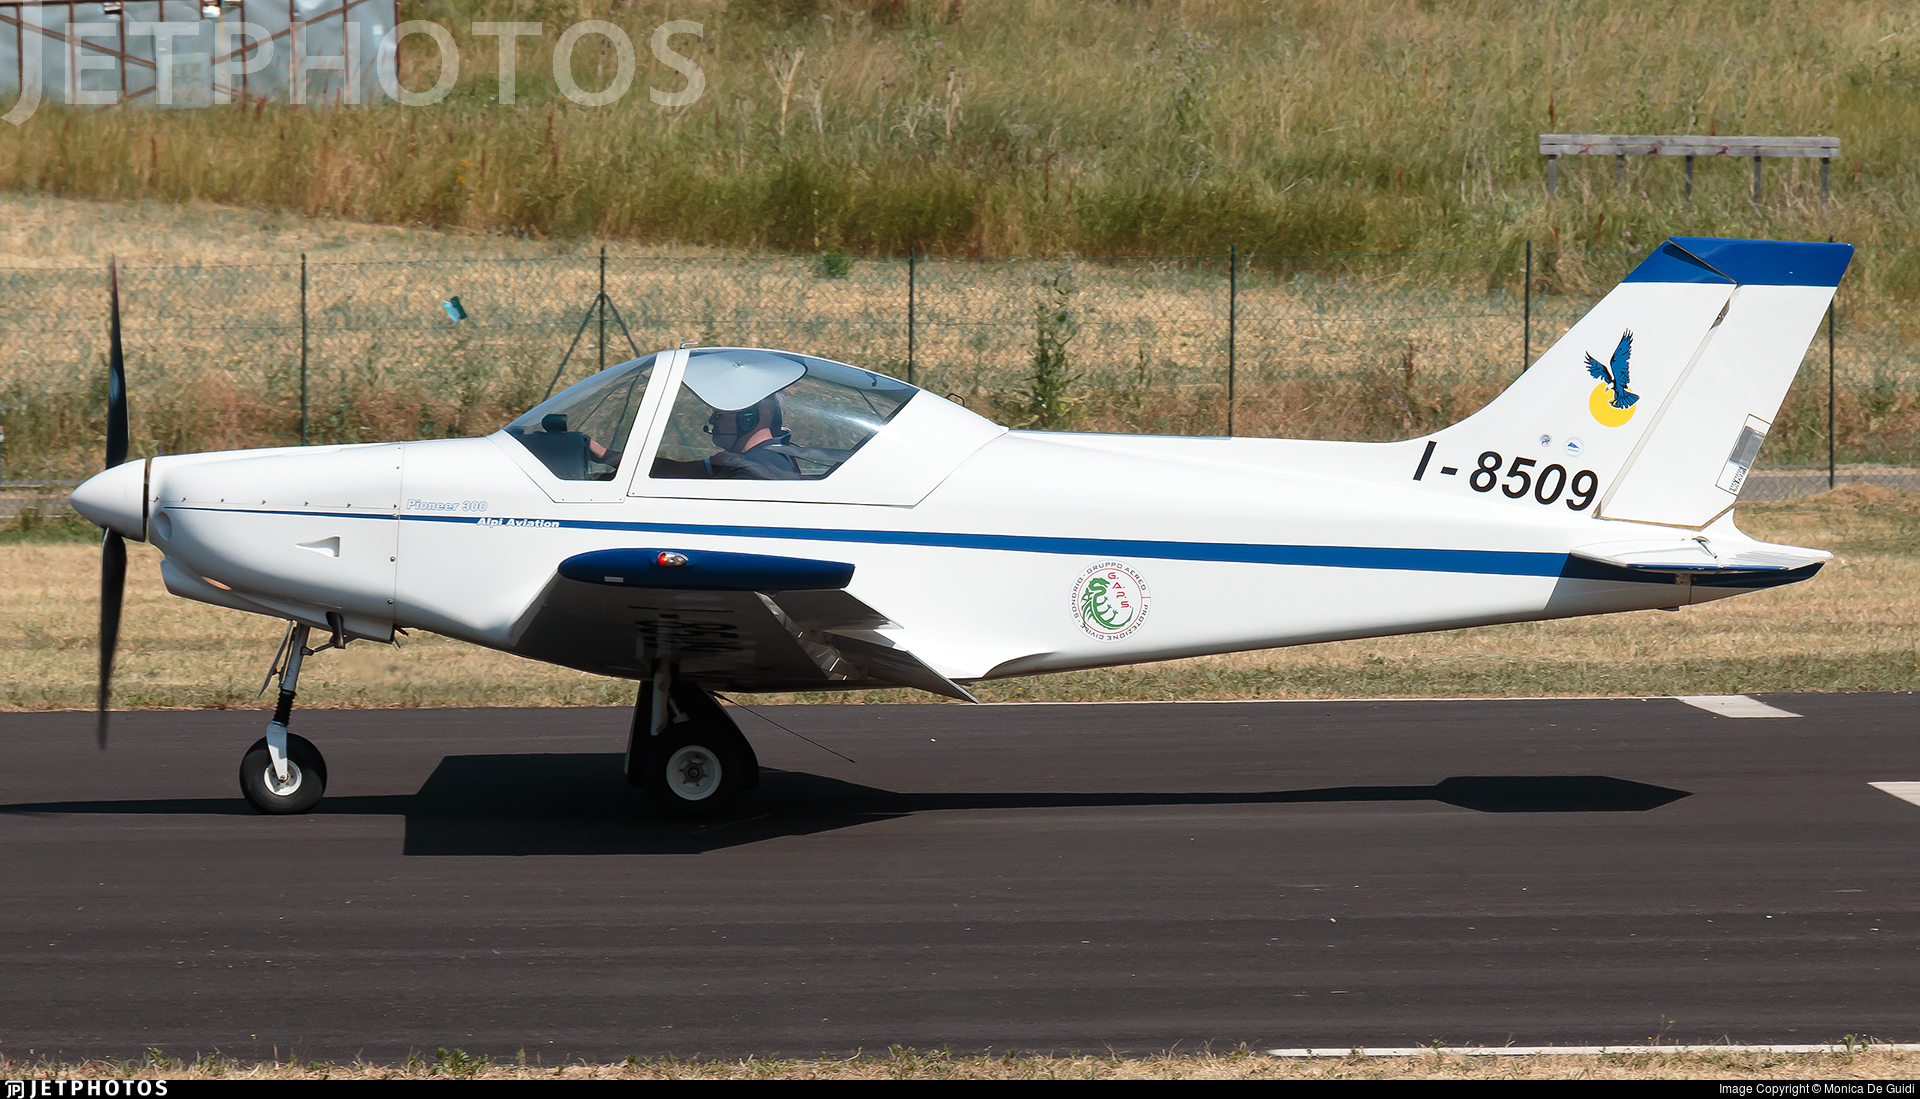 I-8509 - Alpi Pioneer 300 - Private